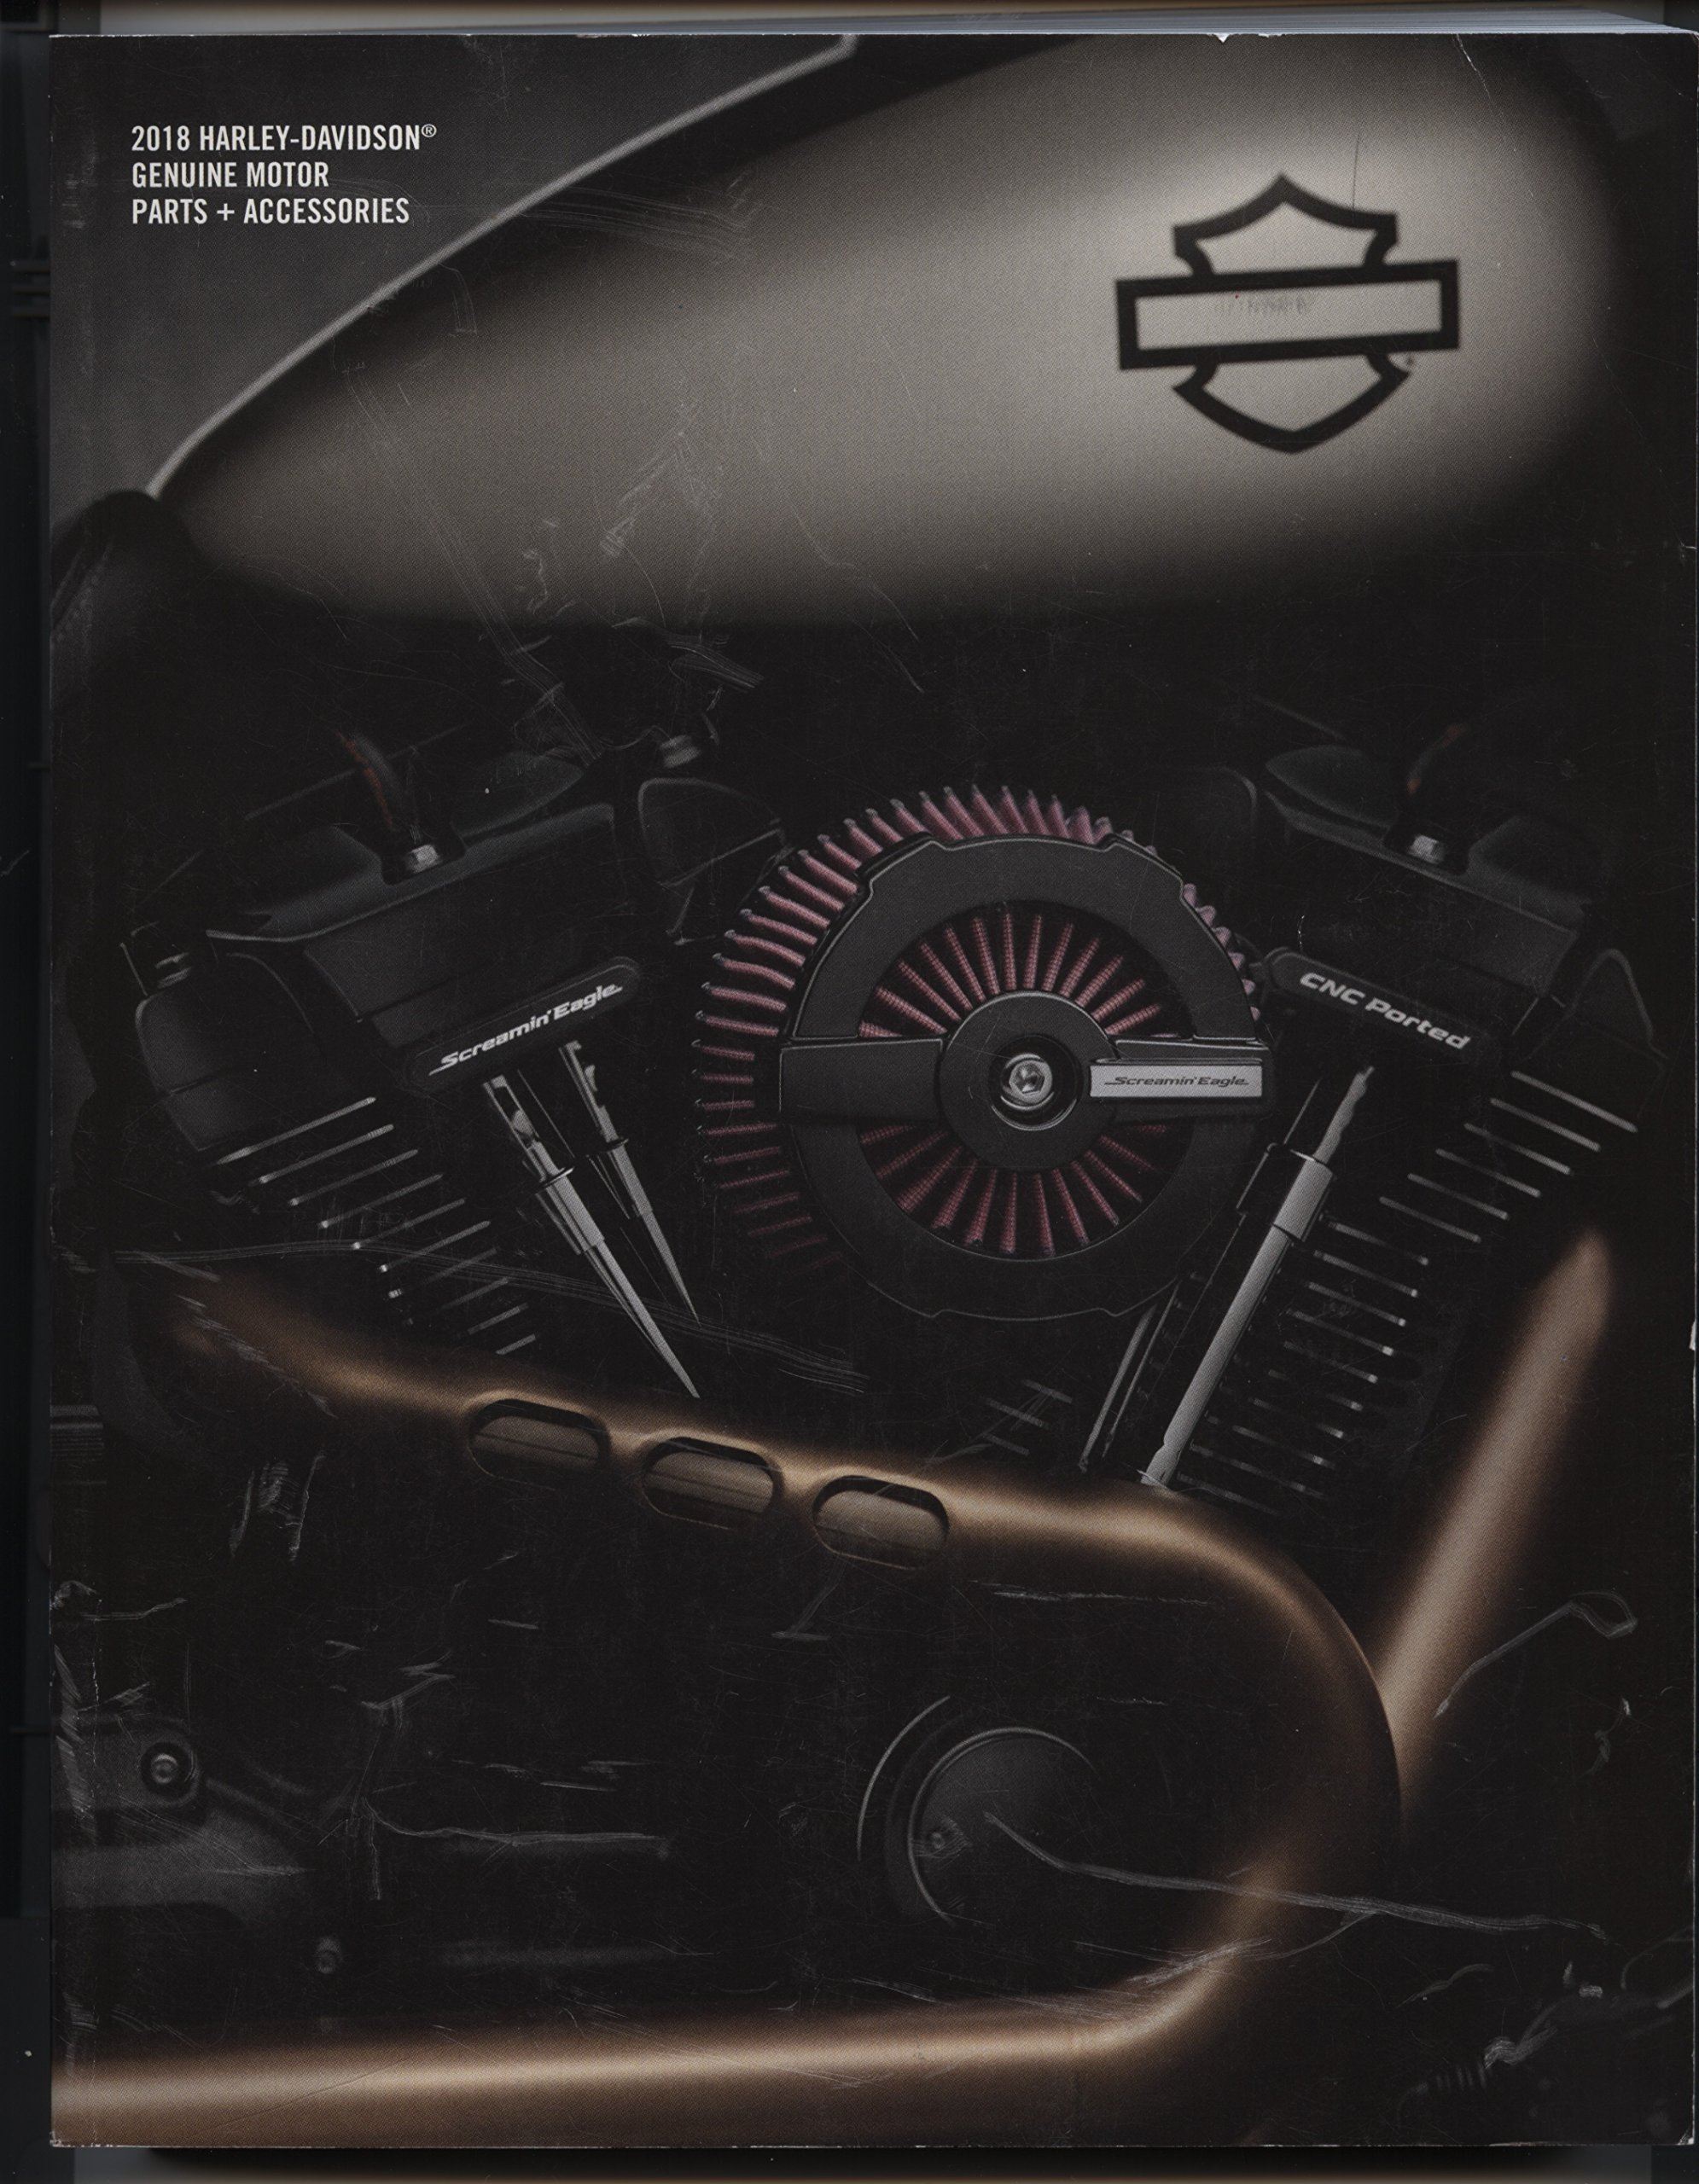 be266eaee7 2018 Harley-Davidson Genuine Motor Parts + Accessories Paperback – January  1, 2017